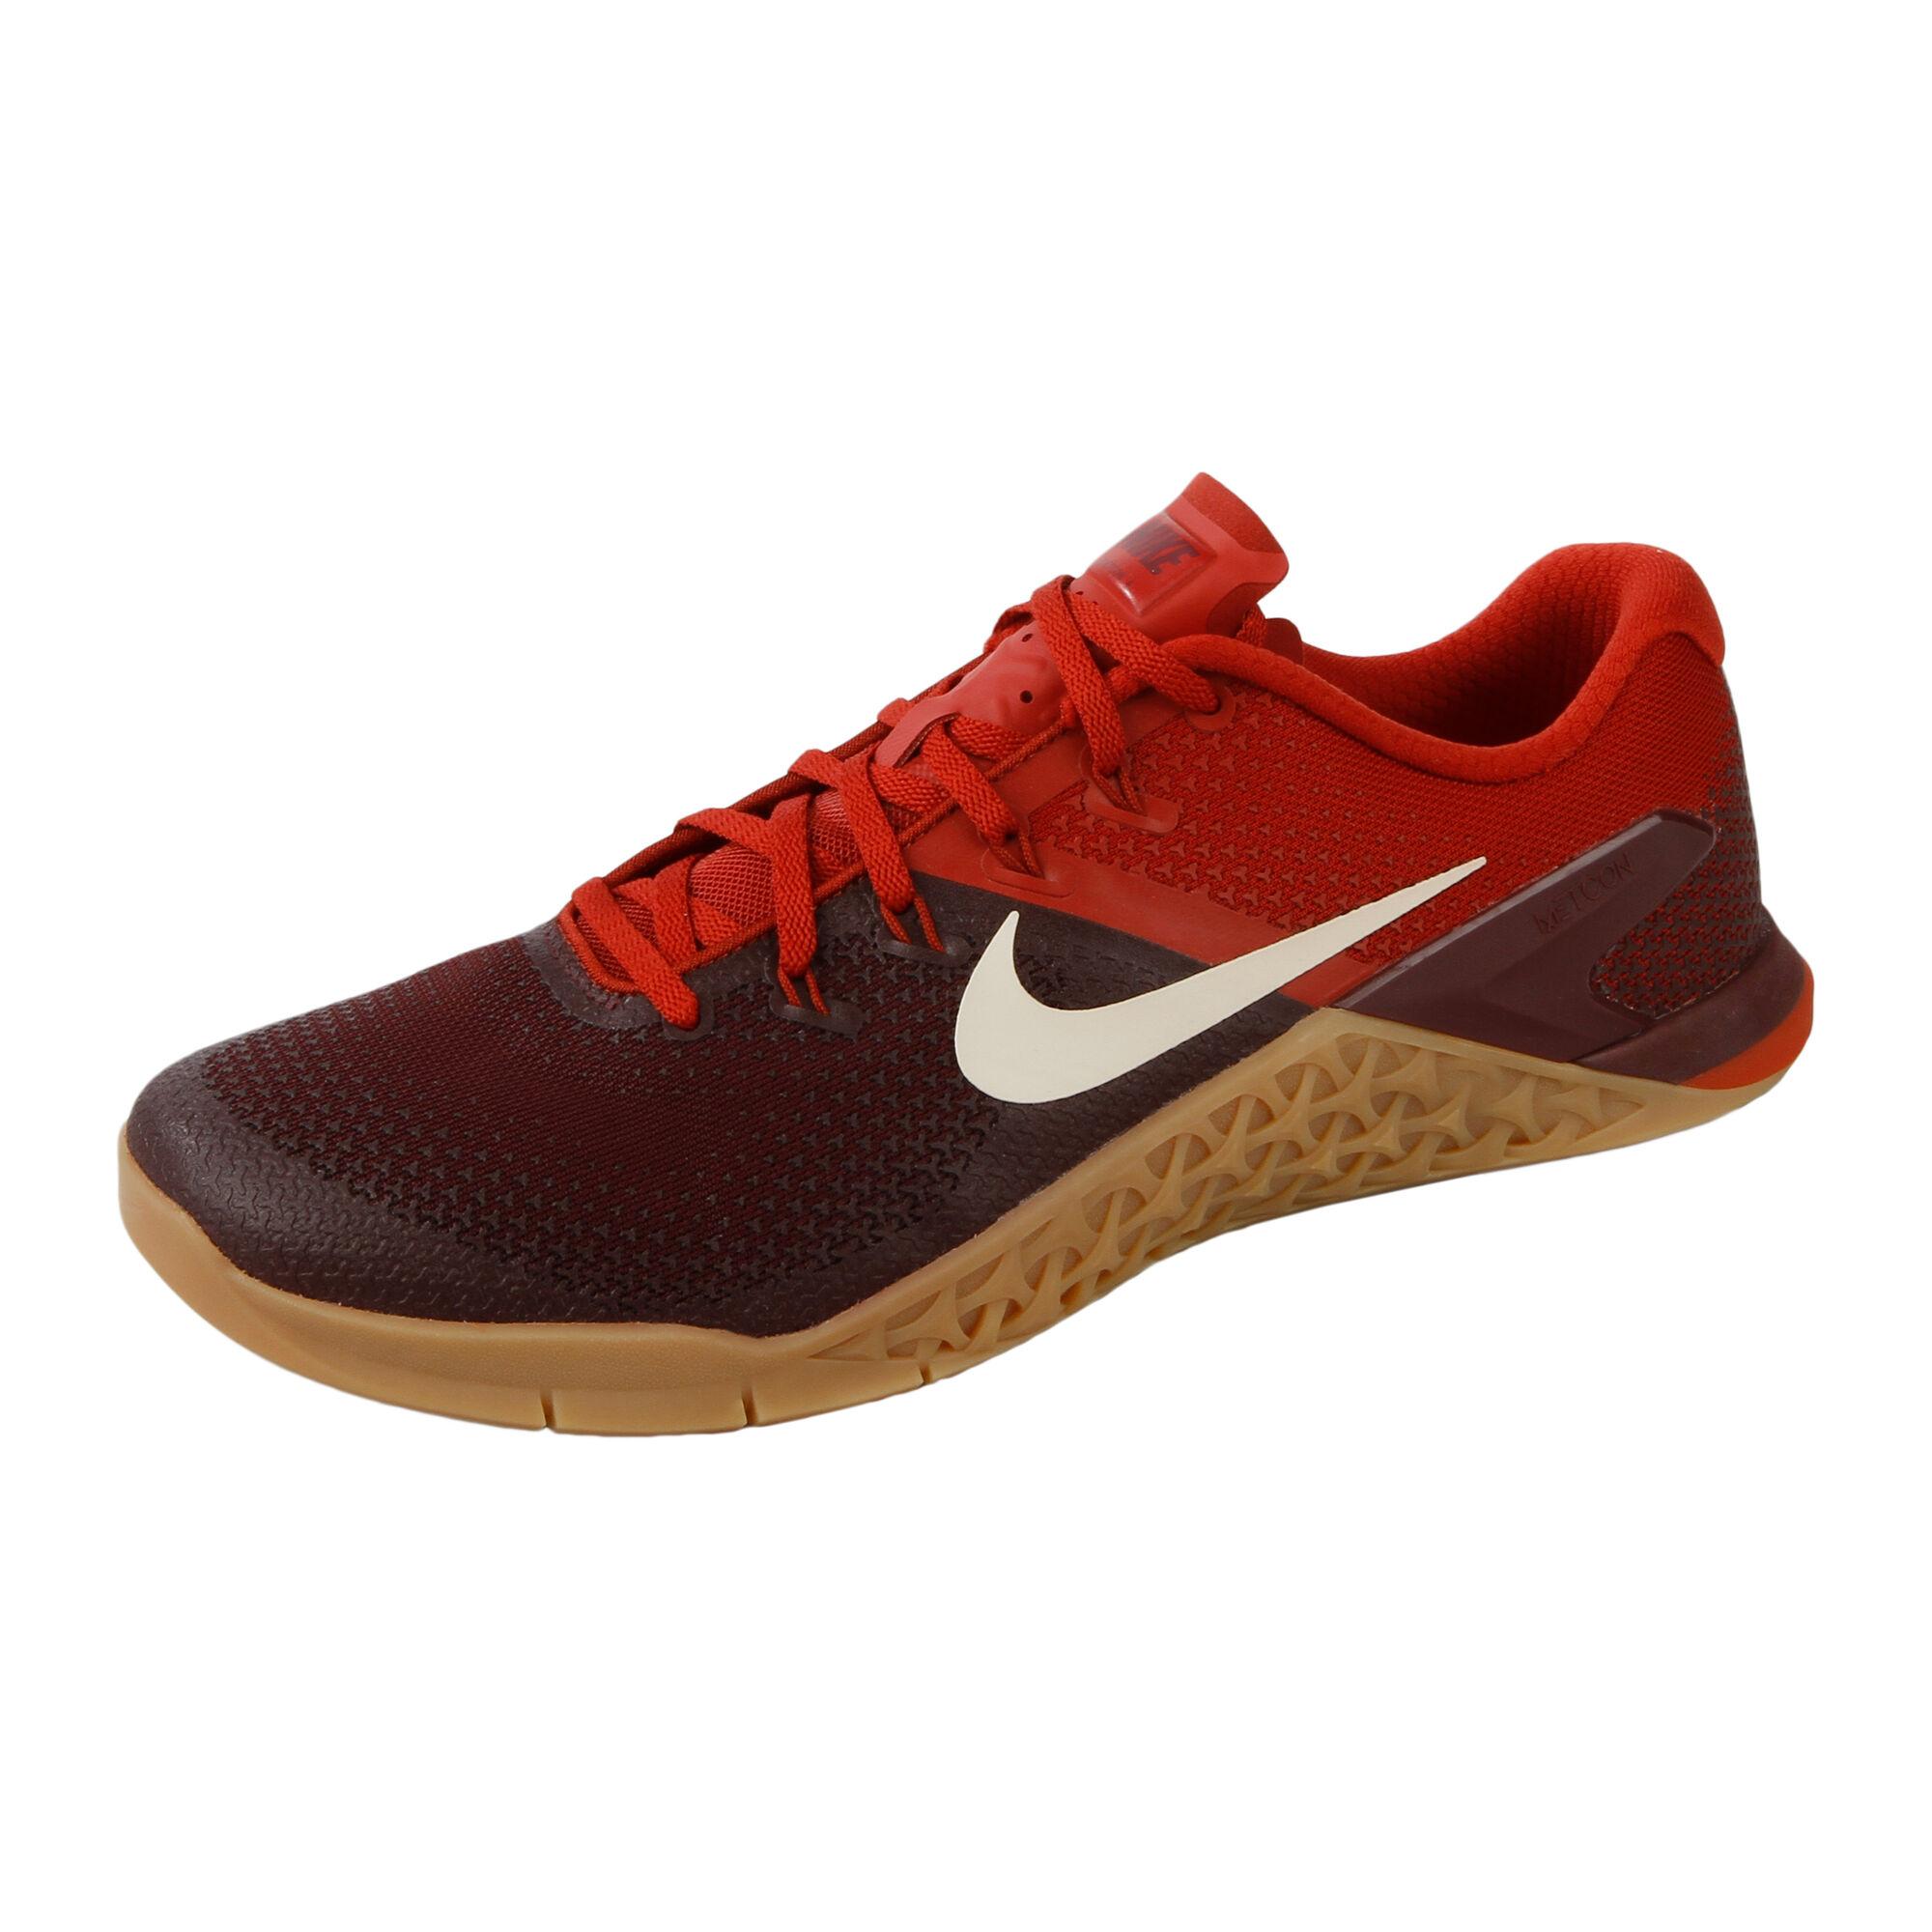 reputable site b0258 dde78 Nike Metcon 4 Fitnessschuh Herren - Dunkelrot, Rot online ka